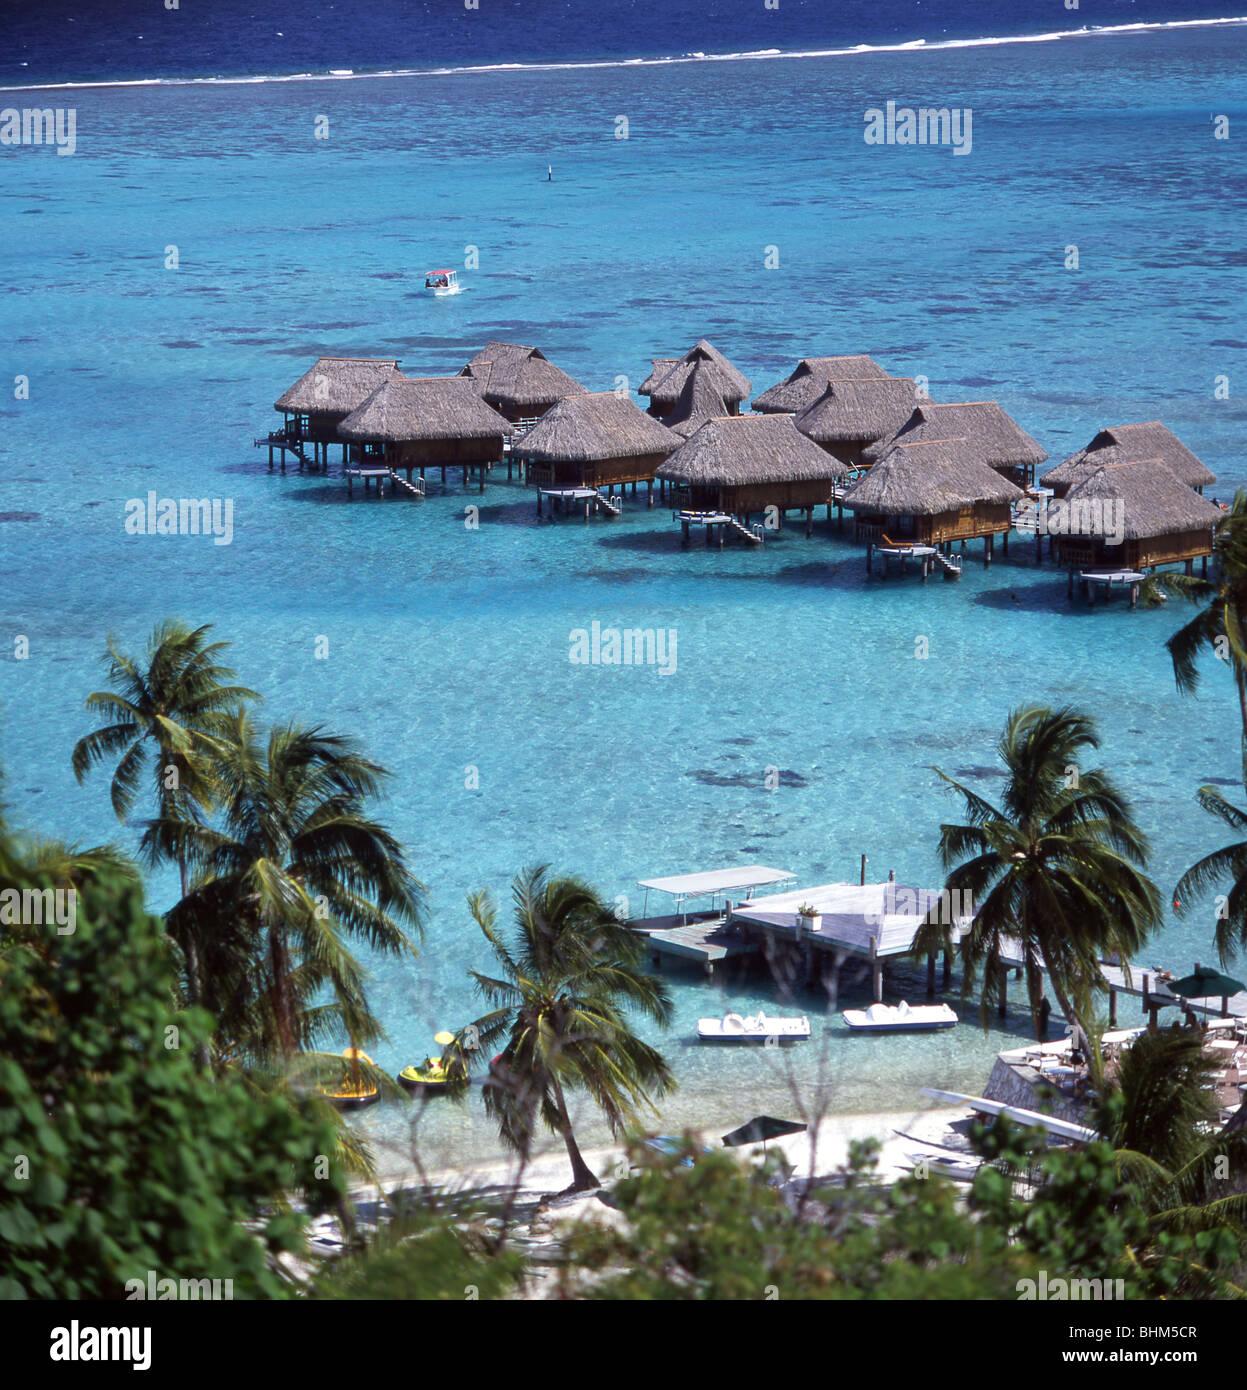 Gentil View Of Cabins Over Sea, Sofitel Hotel, Moorea, Tahiti, French Polynesia